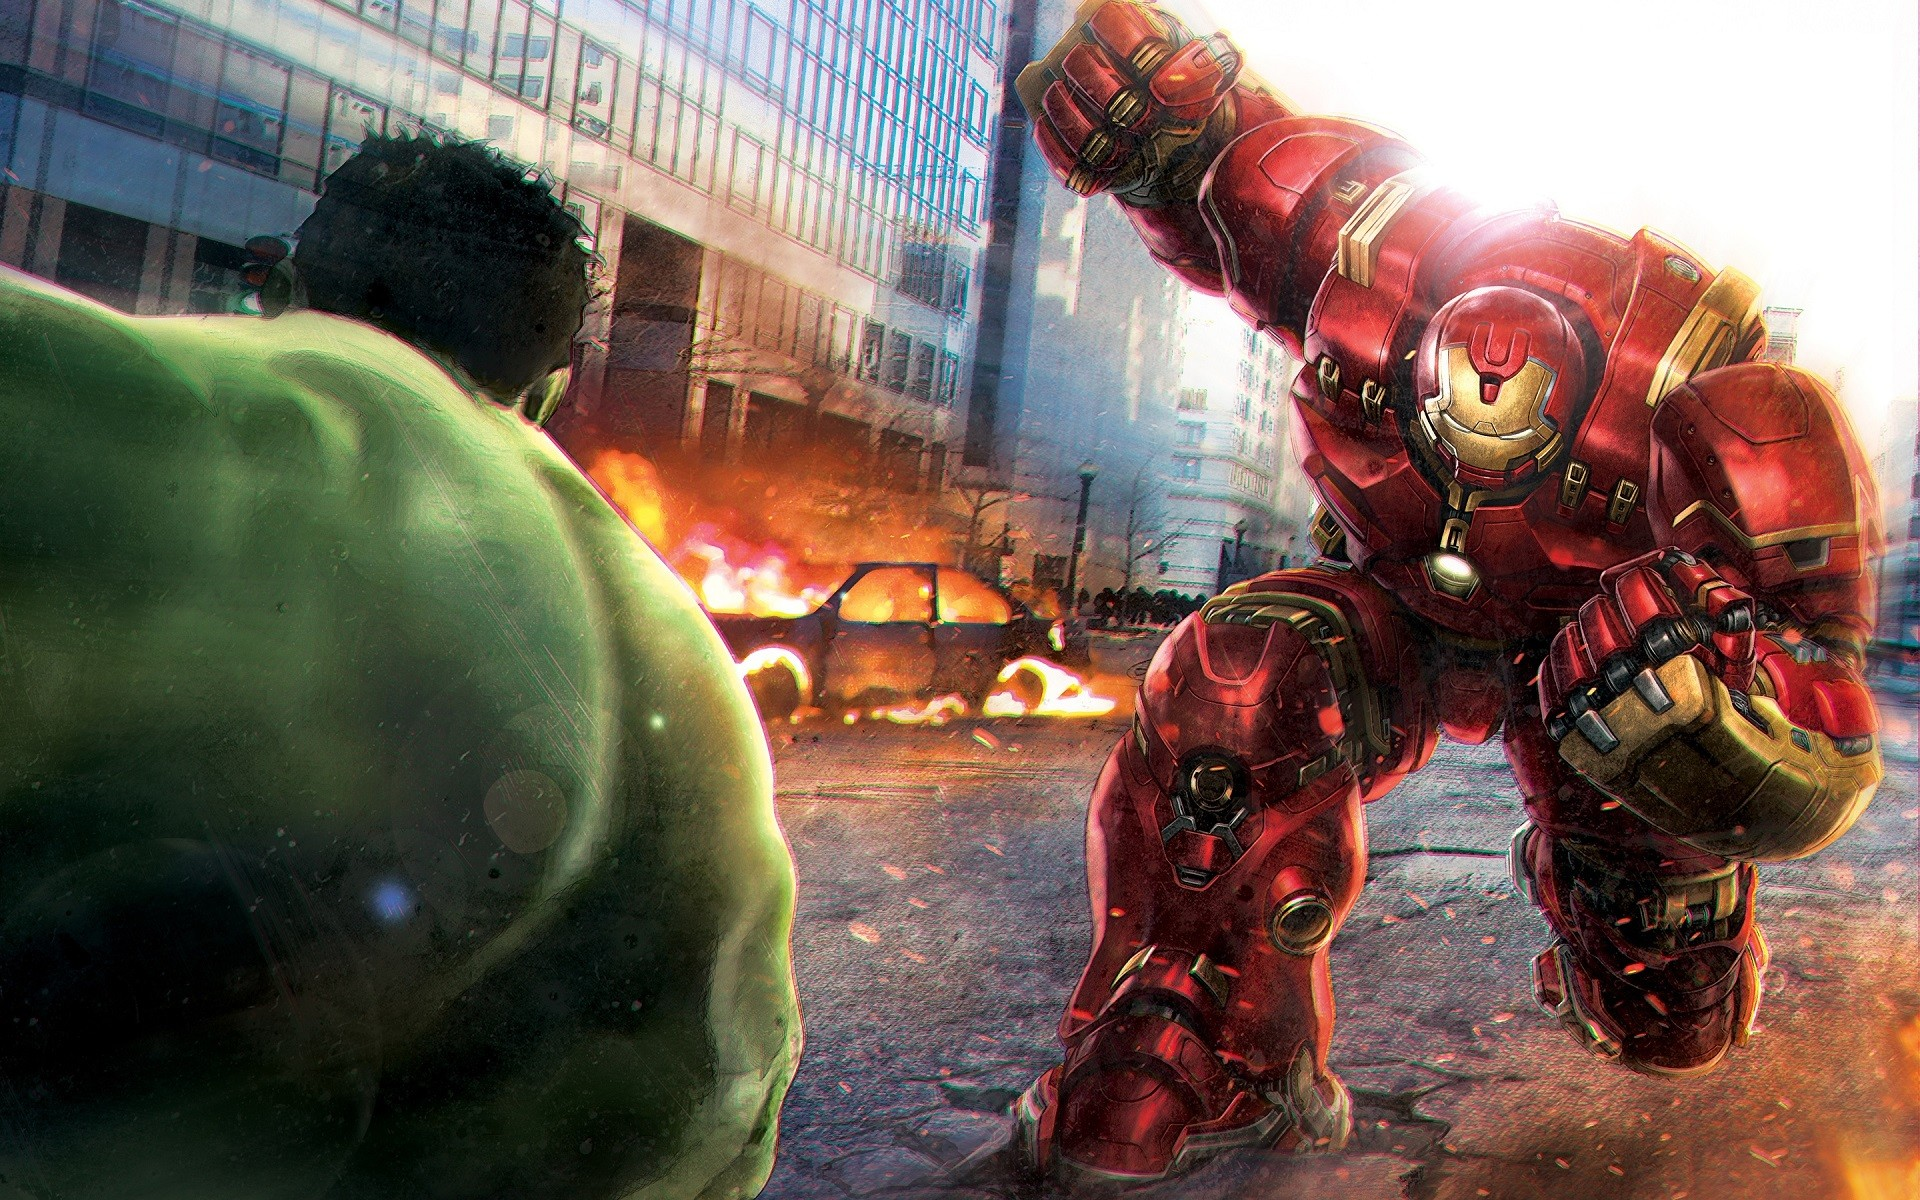 General 1920x1200 The Avengers Avengers: Age of Ultron Iron Man Hulk Marvel Comics comics superhero concept art battle